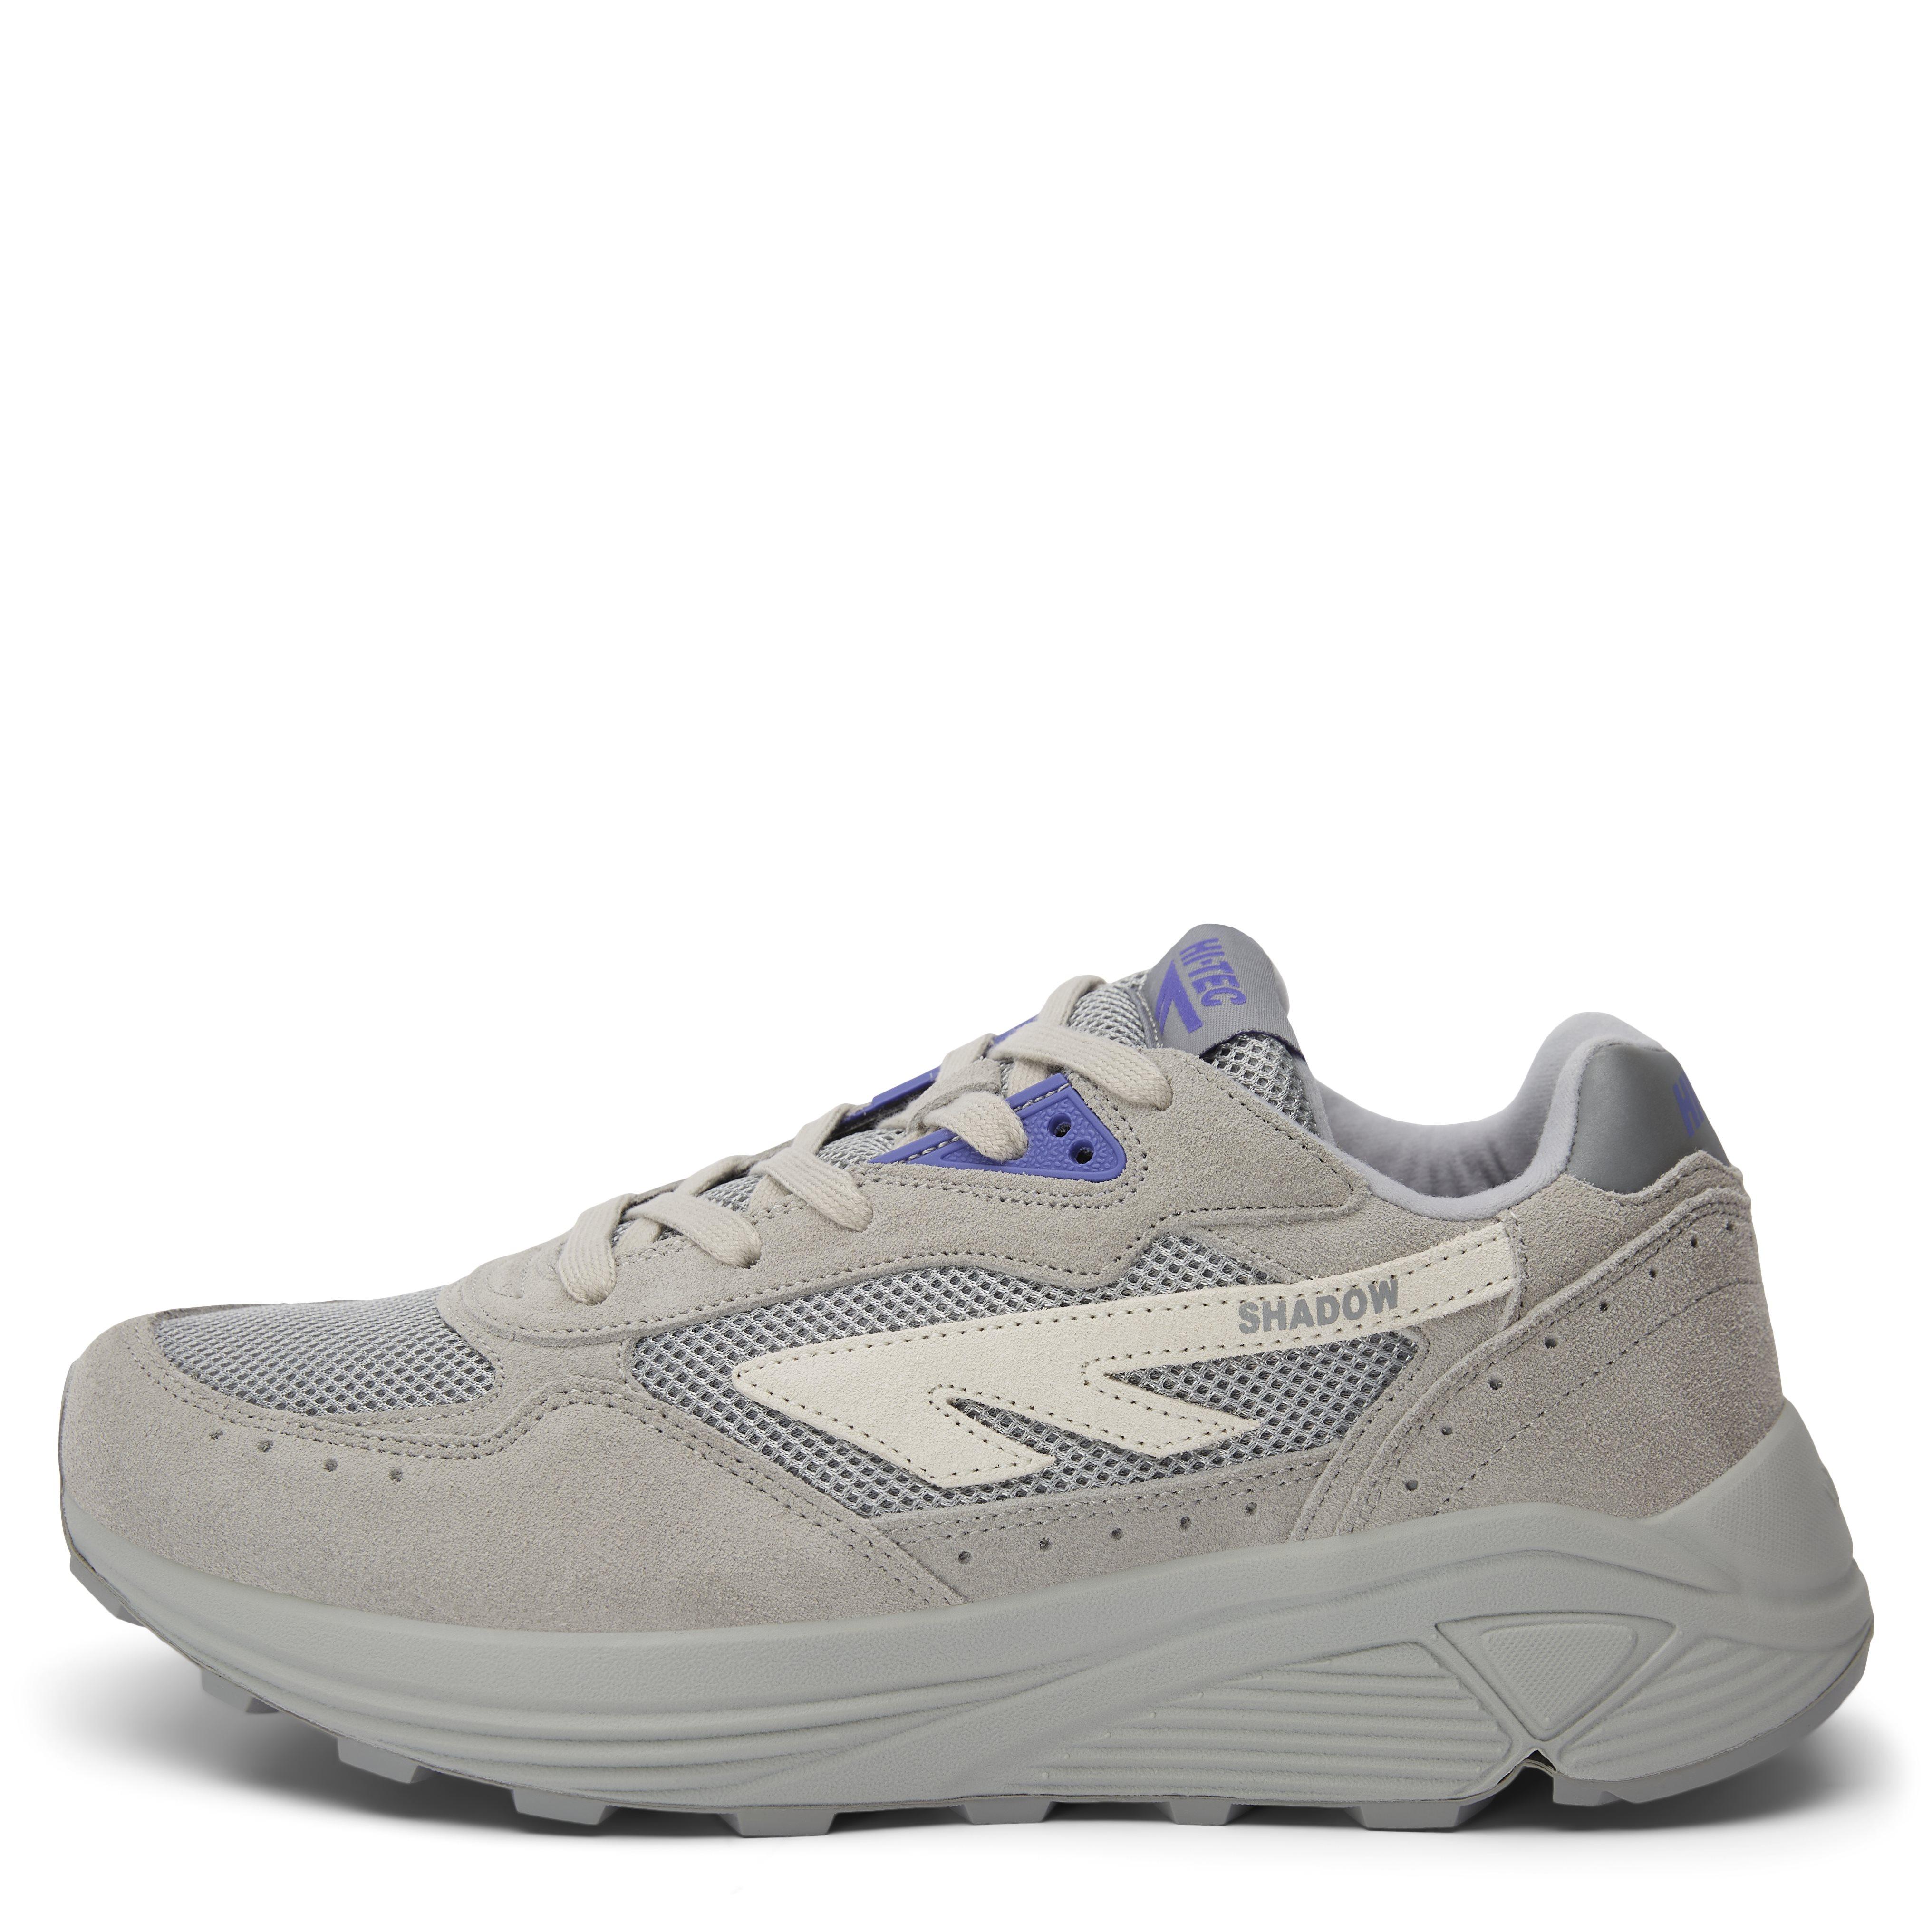 Shadow RGS Sneaker - Shoes - Grey